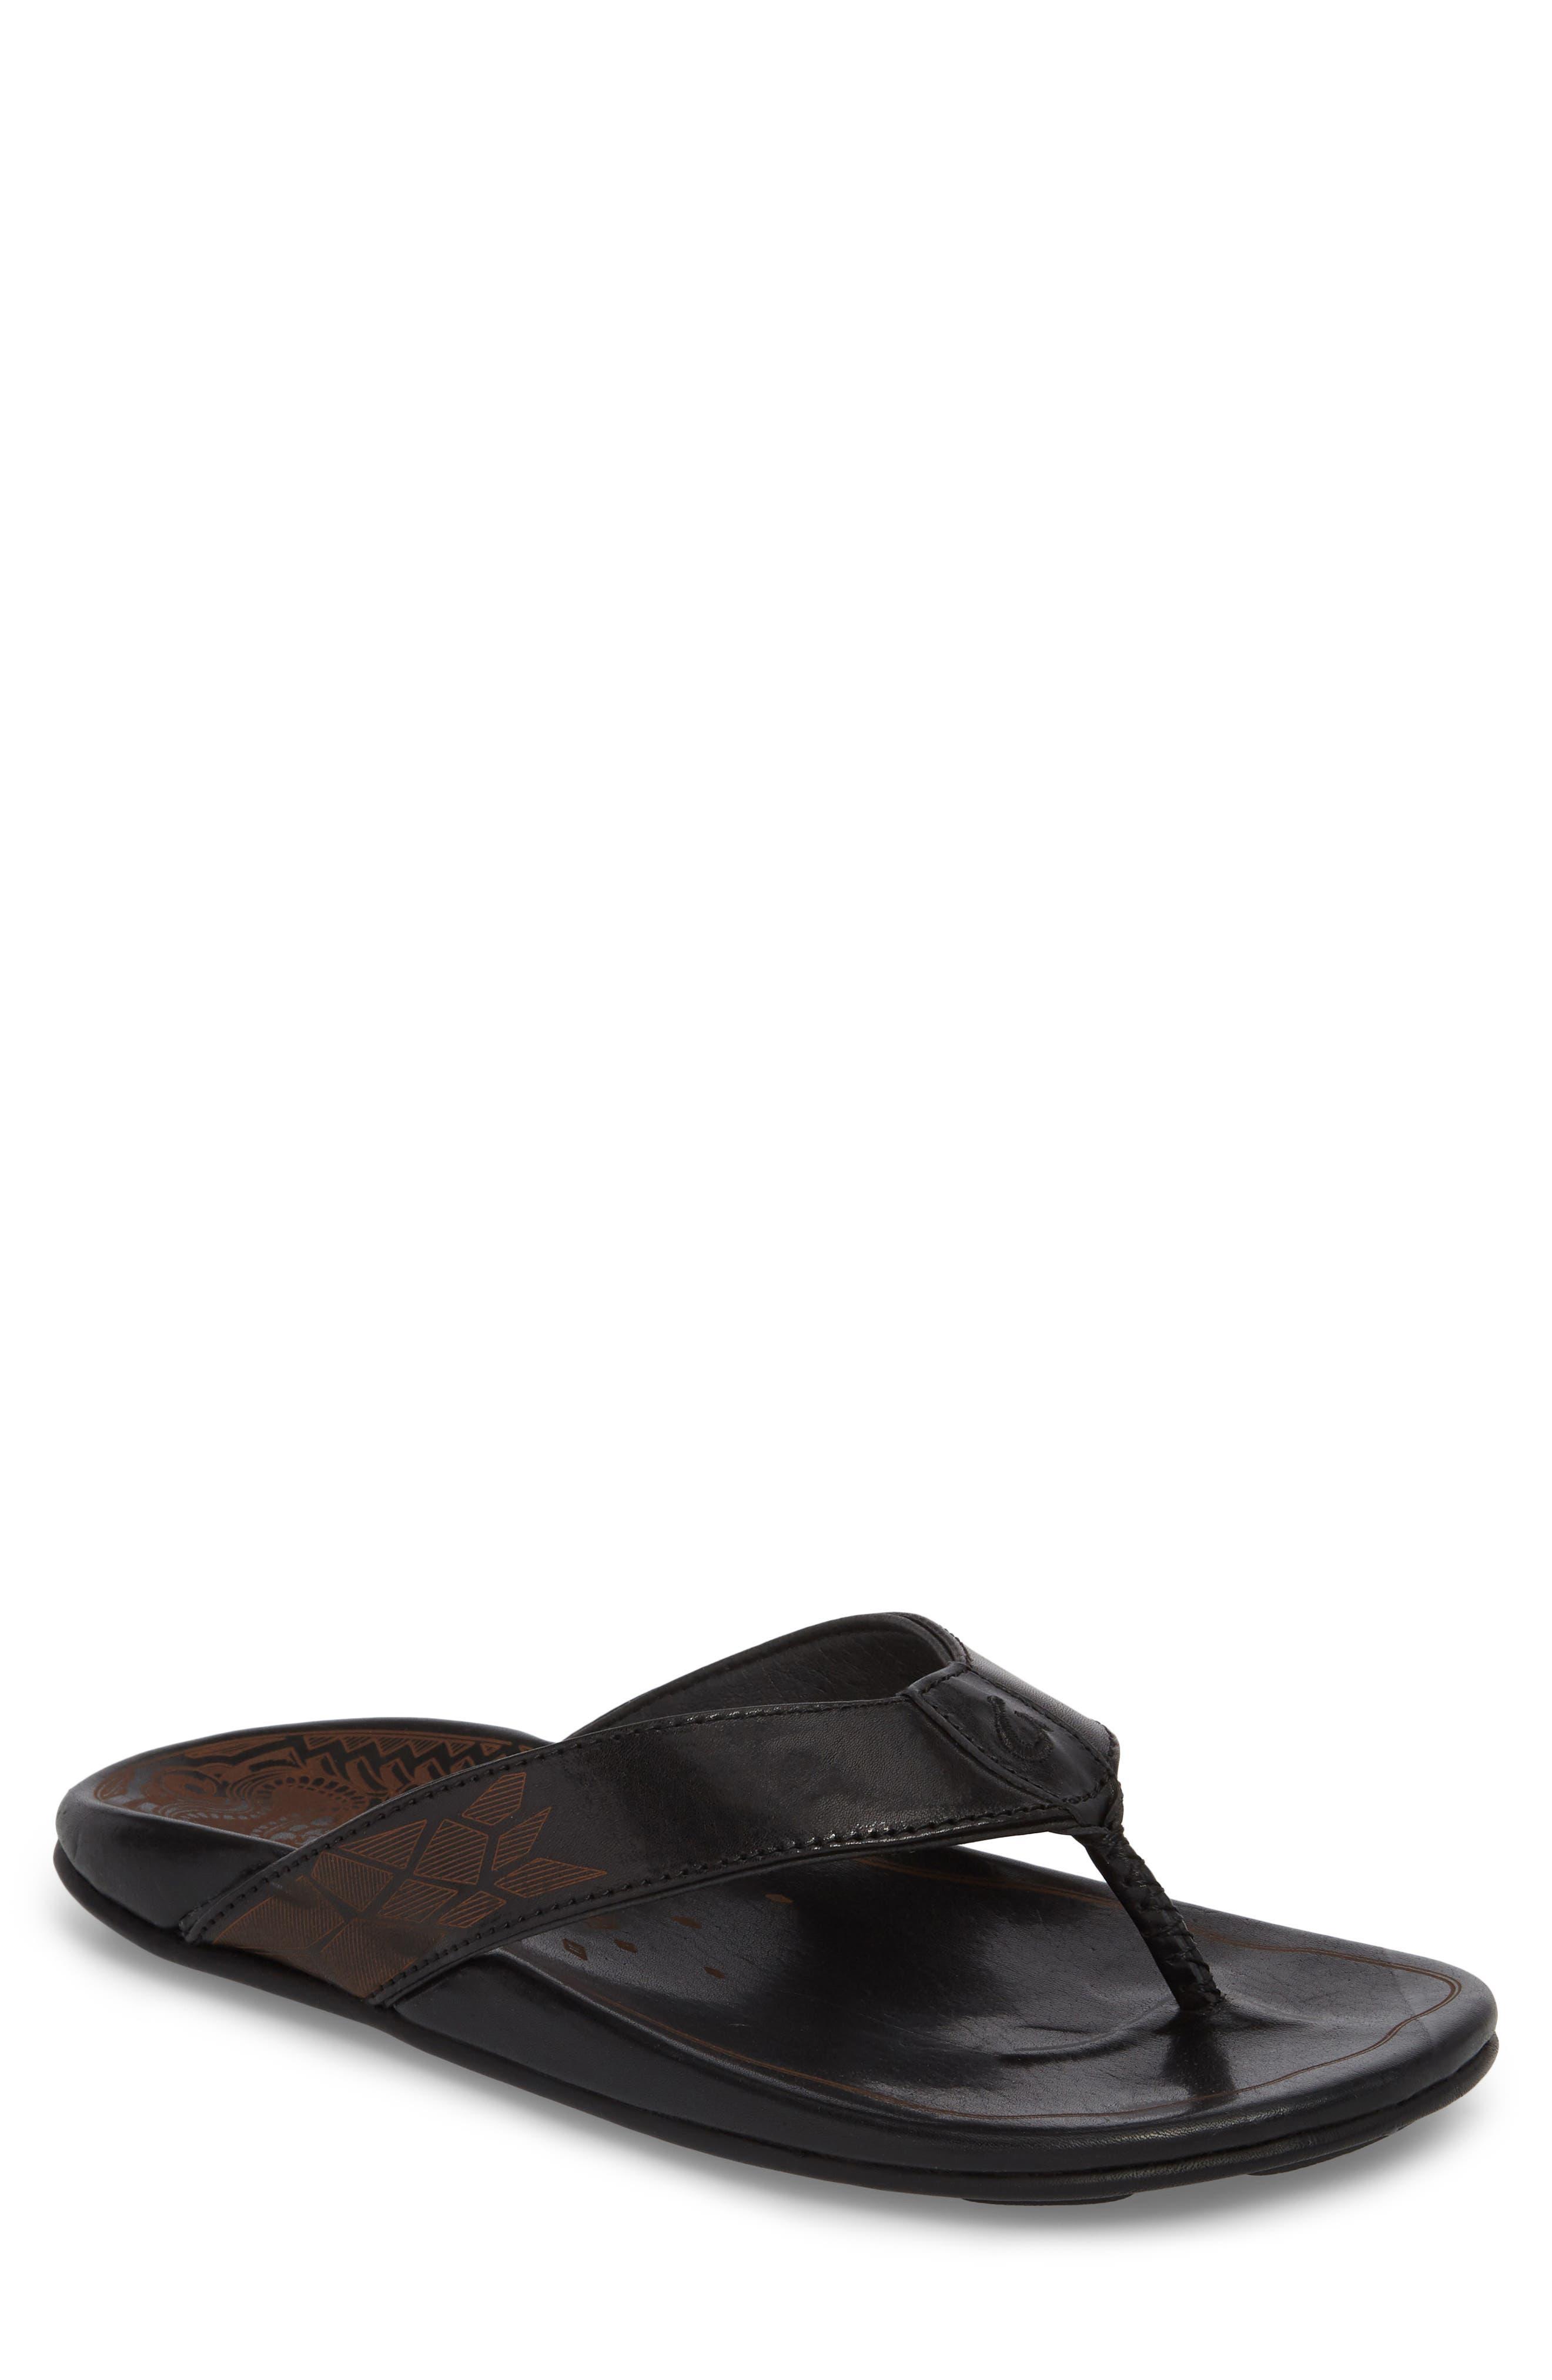 Kulia Flip Flop,                             Main thumbnail 1, color,                             Black/ Black Leather